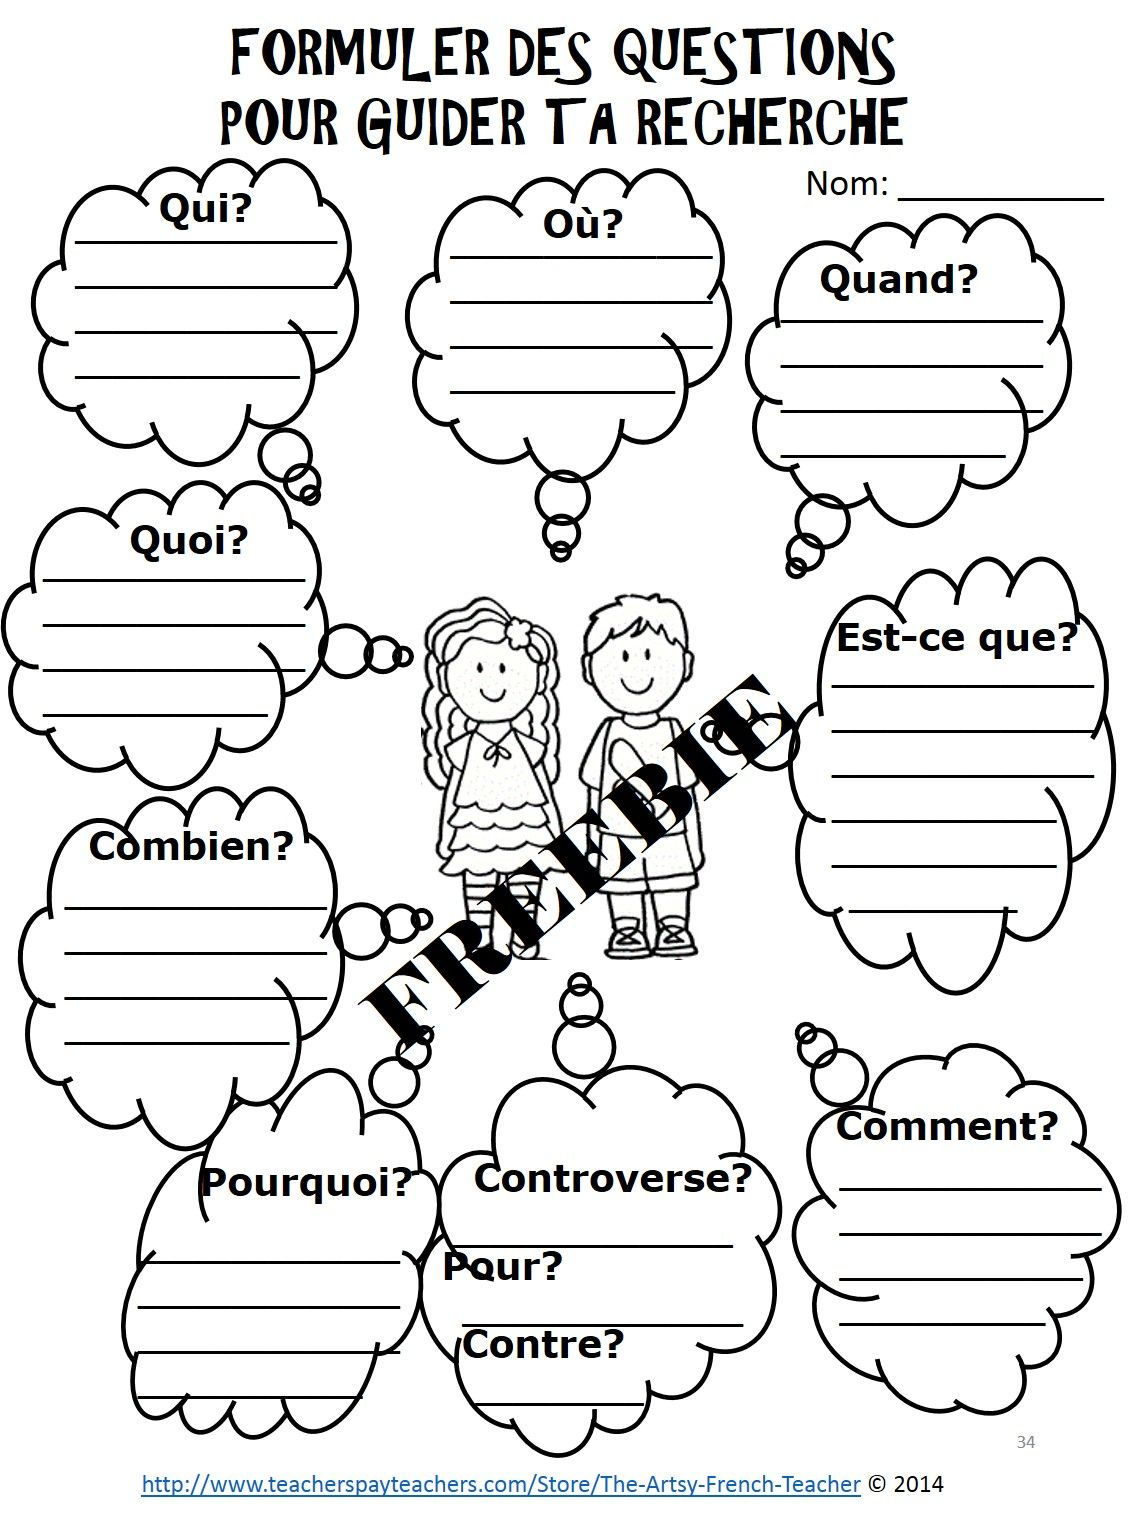 Voila 5 Organigrammes Gratuits De La Ressource Les Etudes